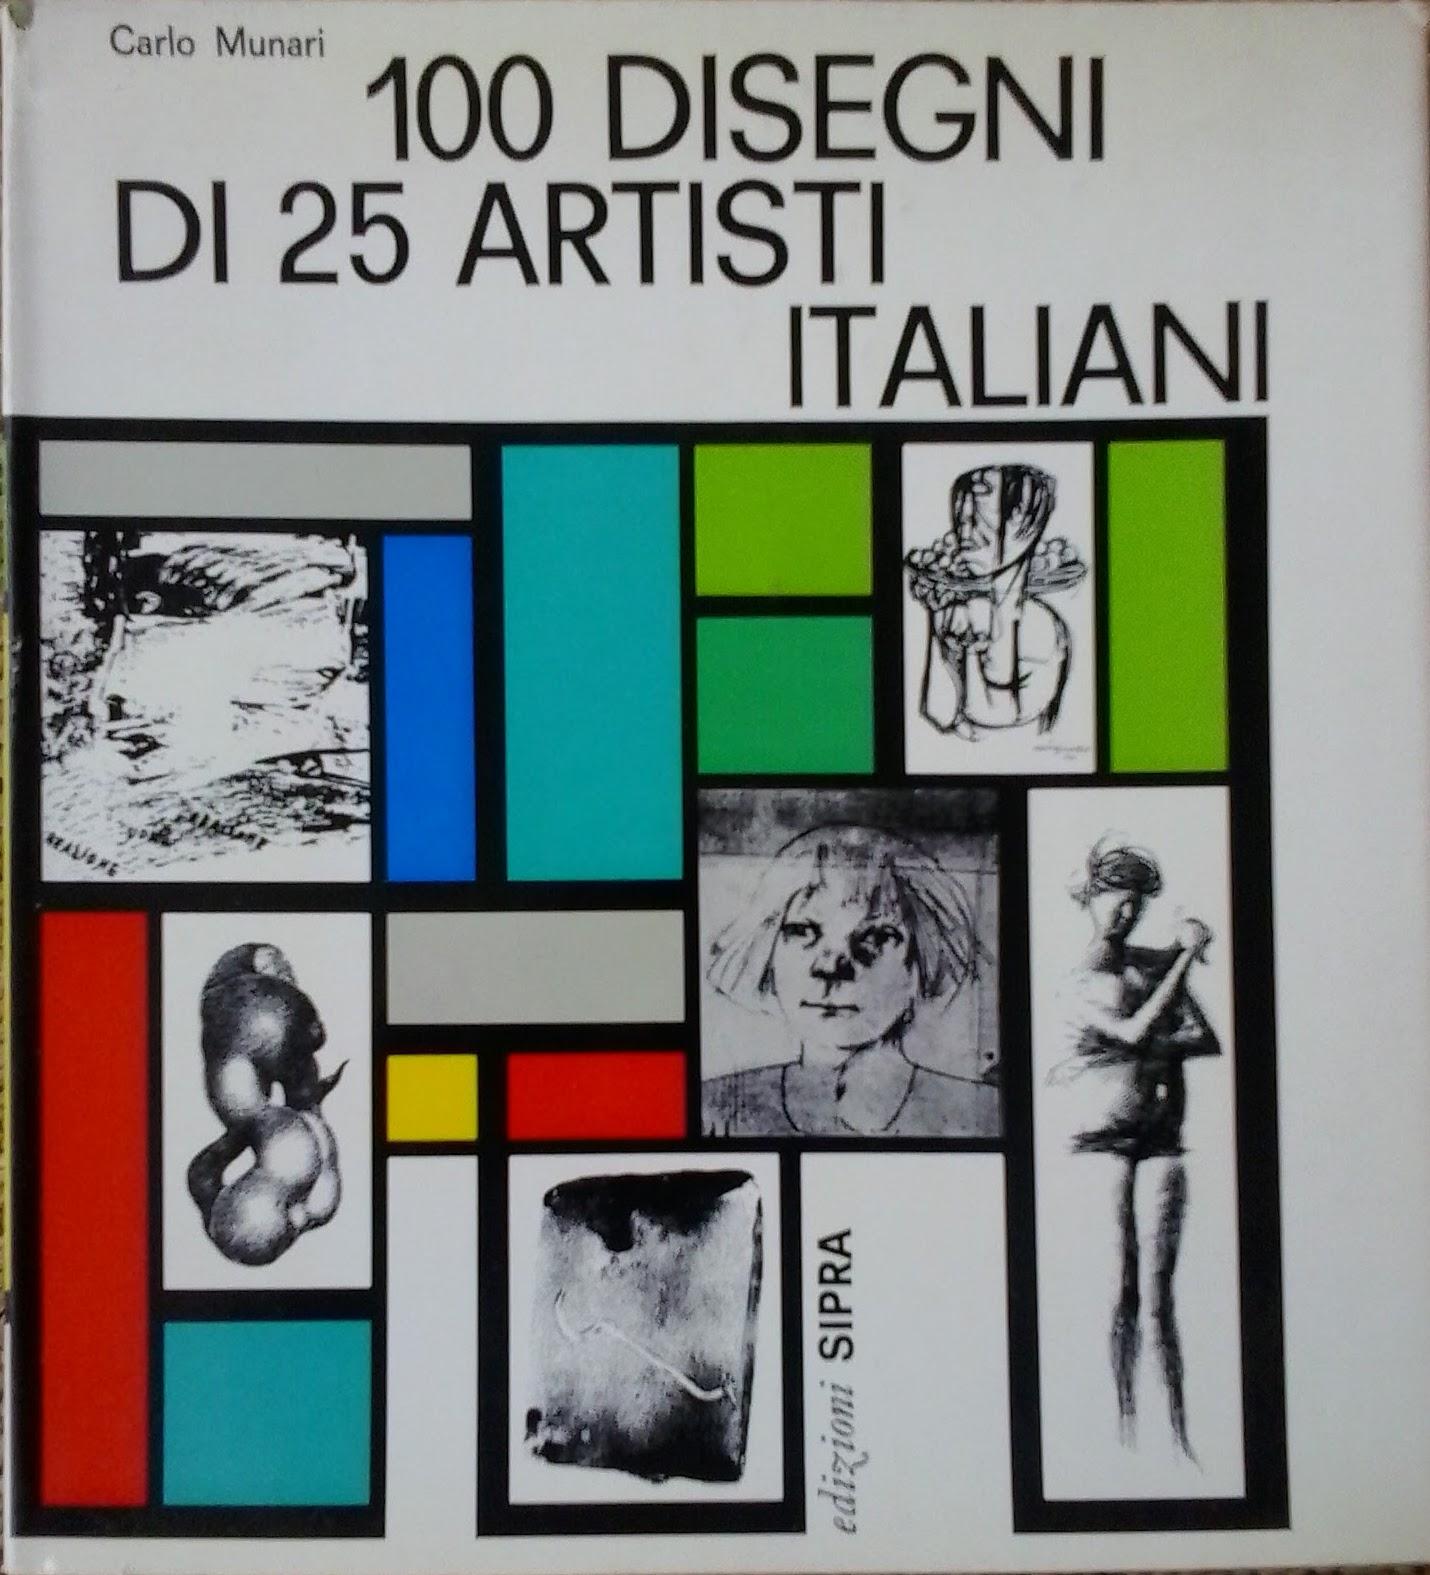 100 disegni di 25 artisti italiani